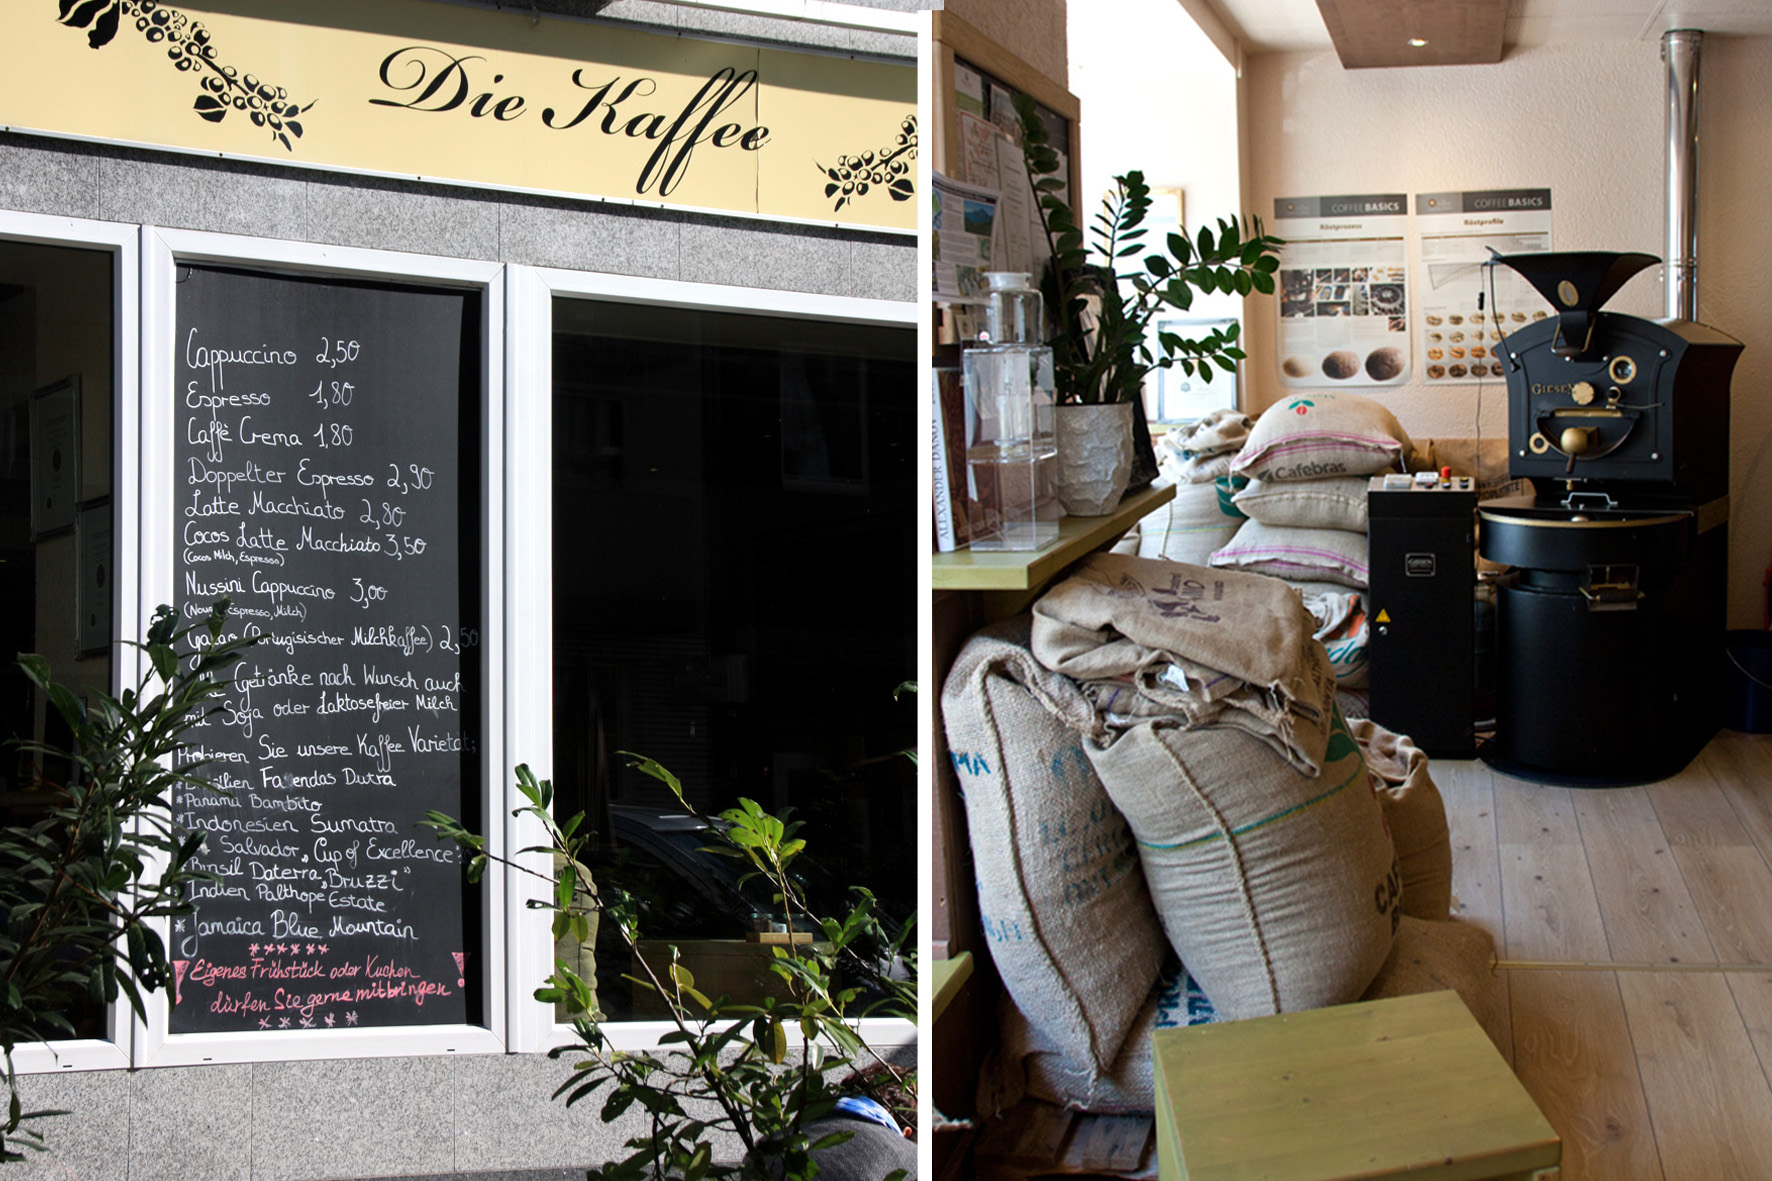 die_kaffee_interior